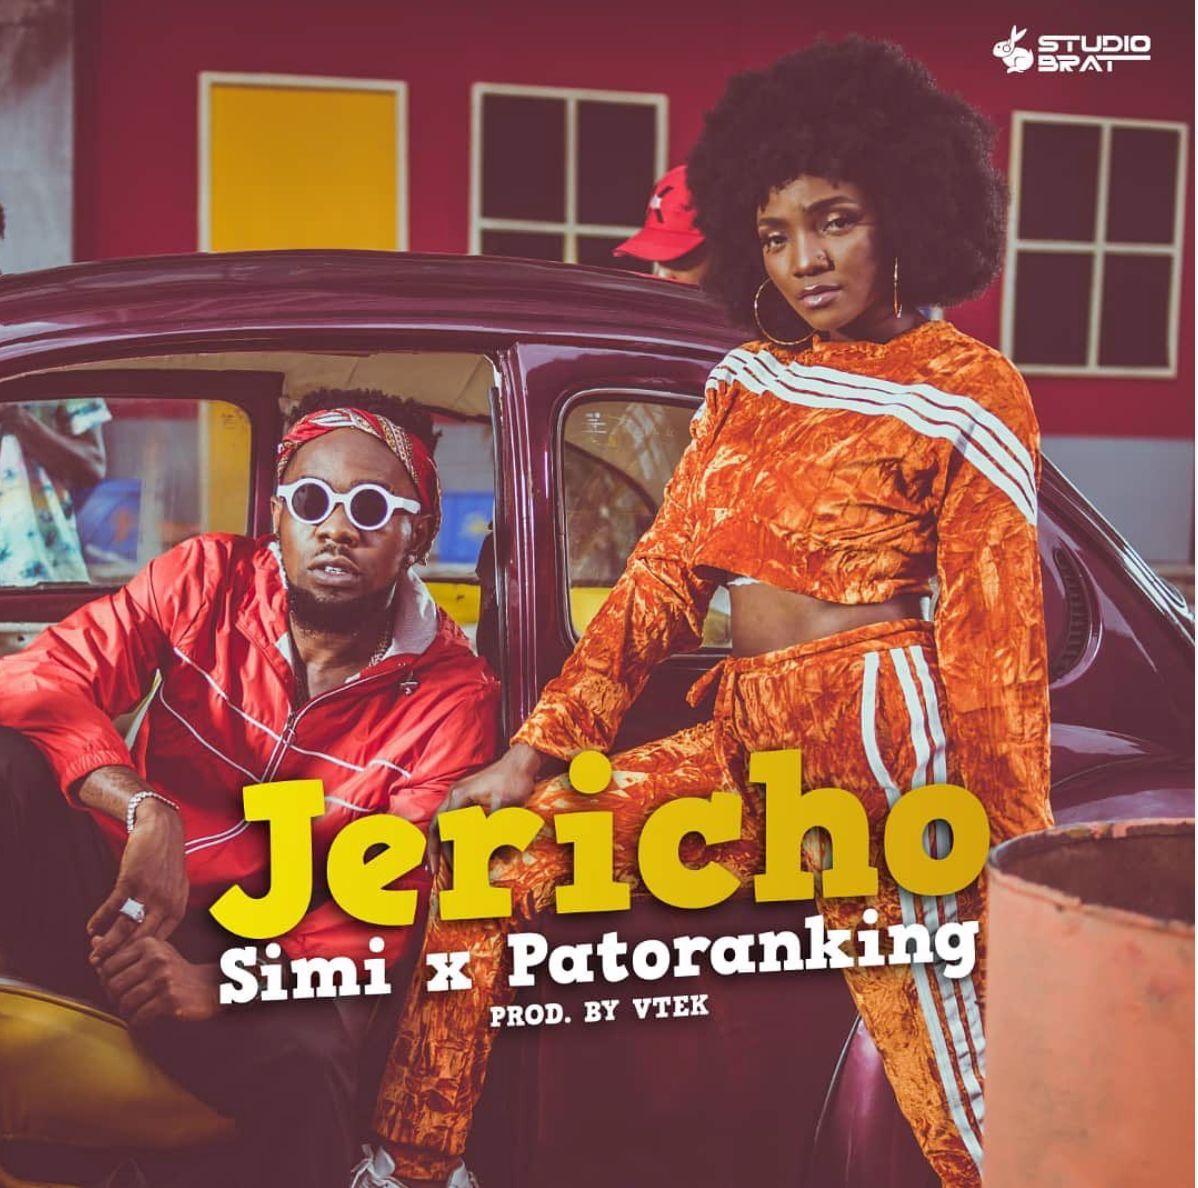 Simi ft. Patoranking - Jericho (Lyric Video)